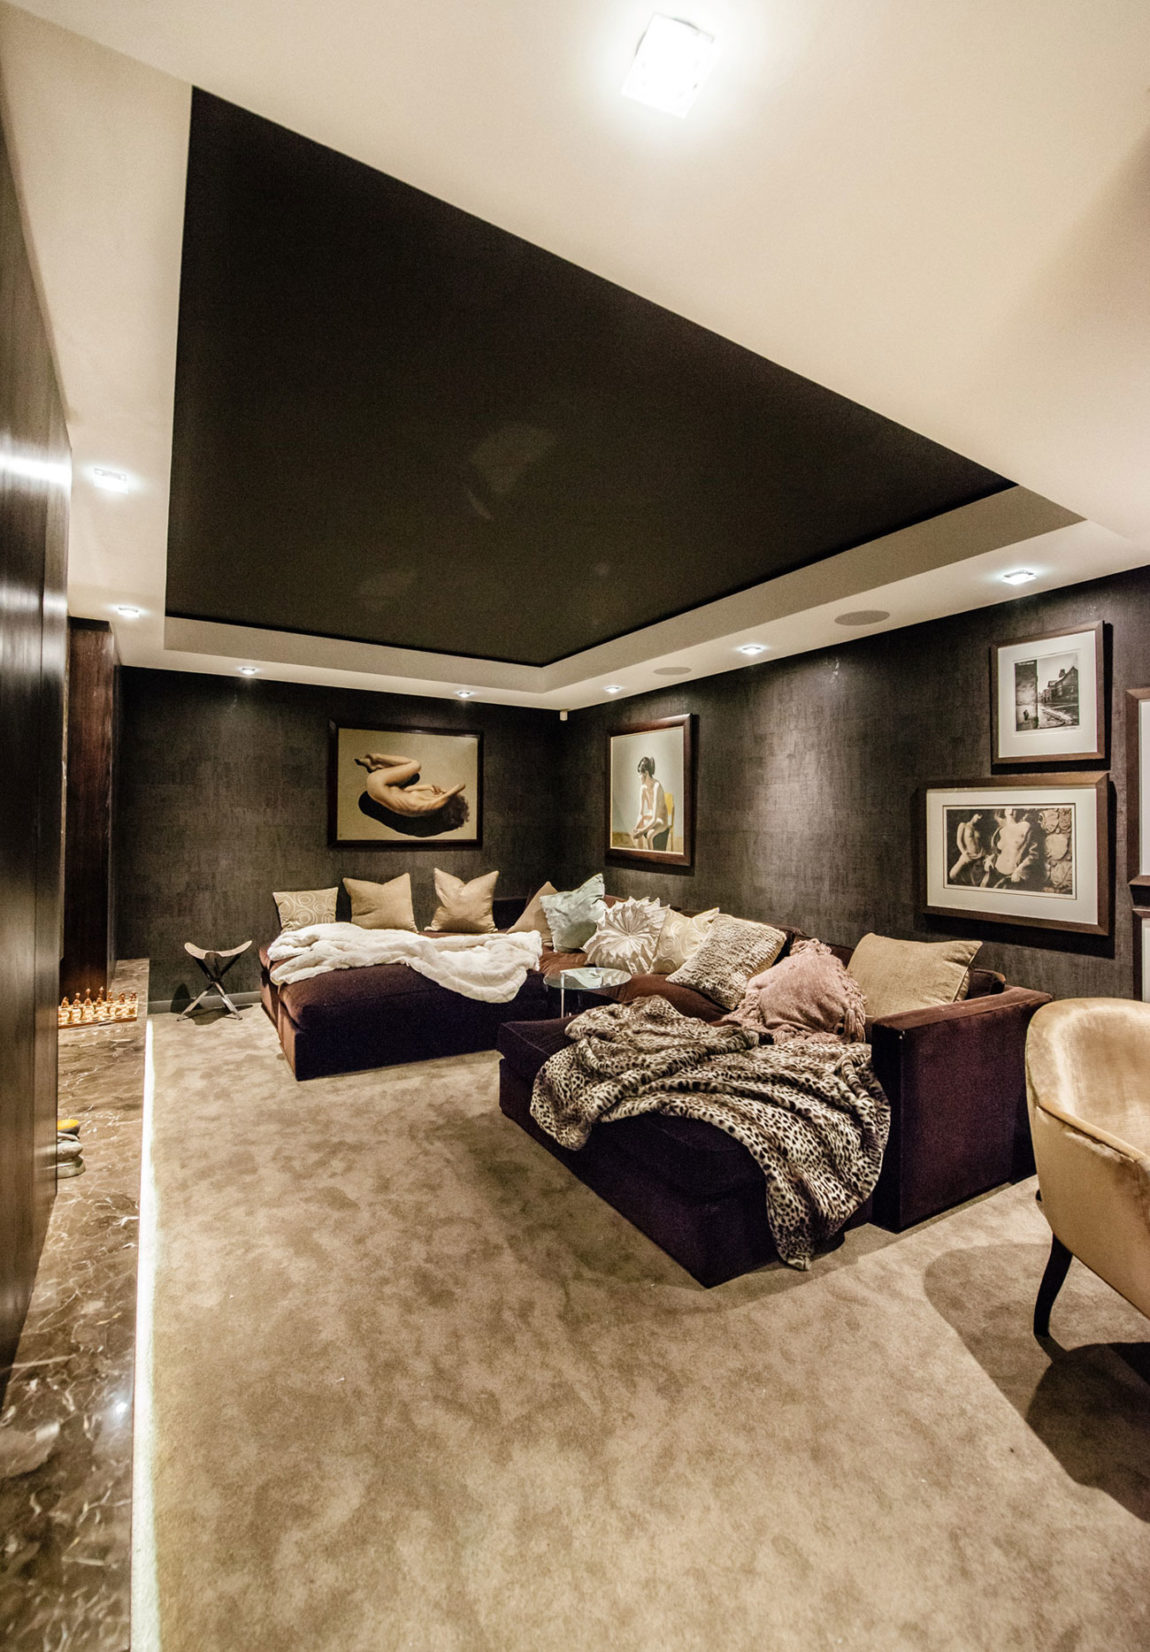 Atlantic Seaboard Apartment Refurbishment by InHouse Br (5)